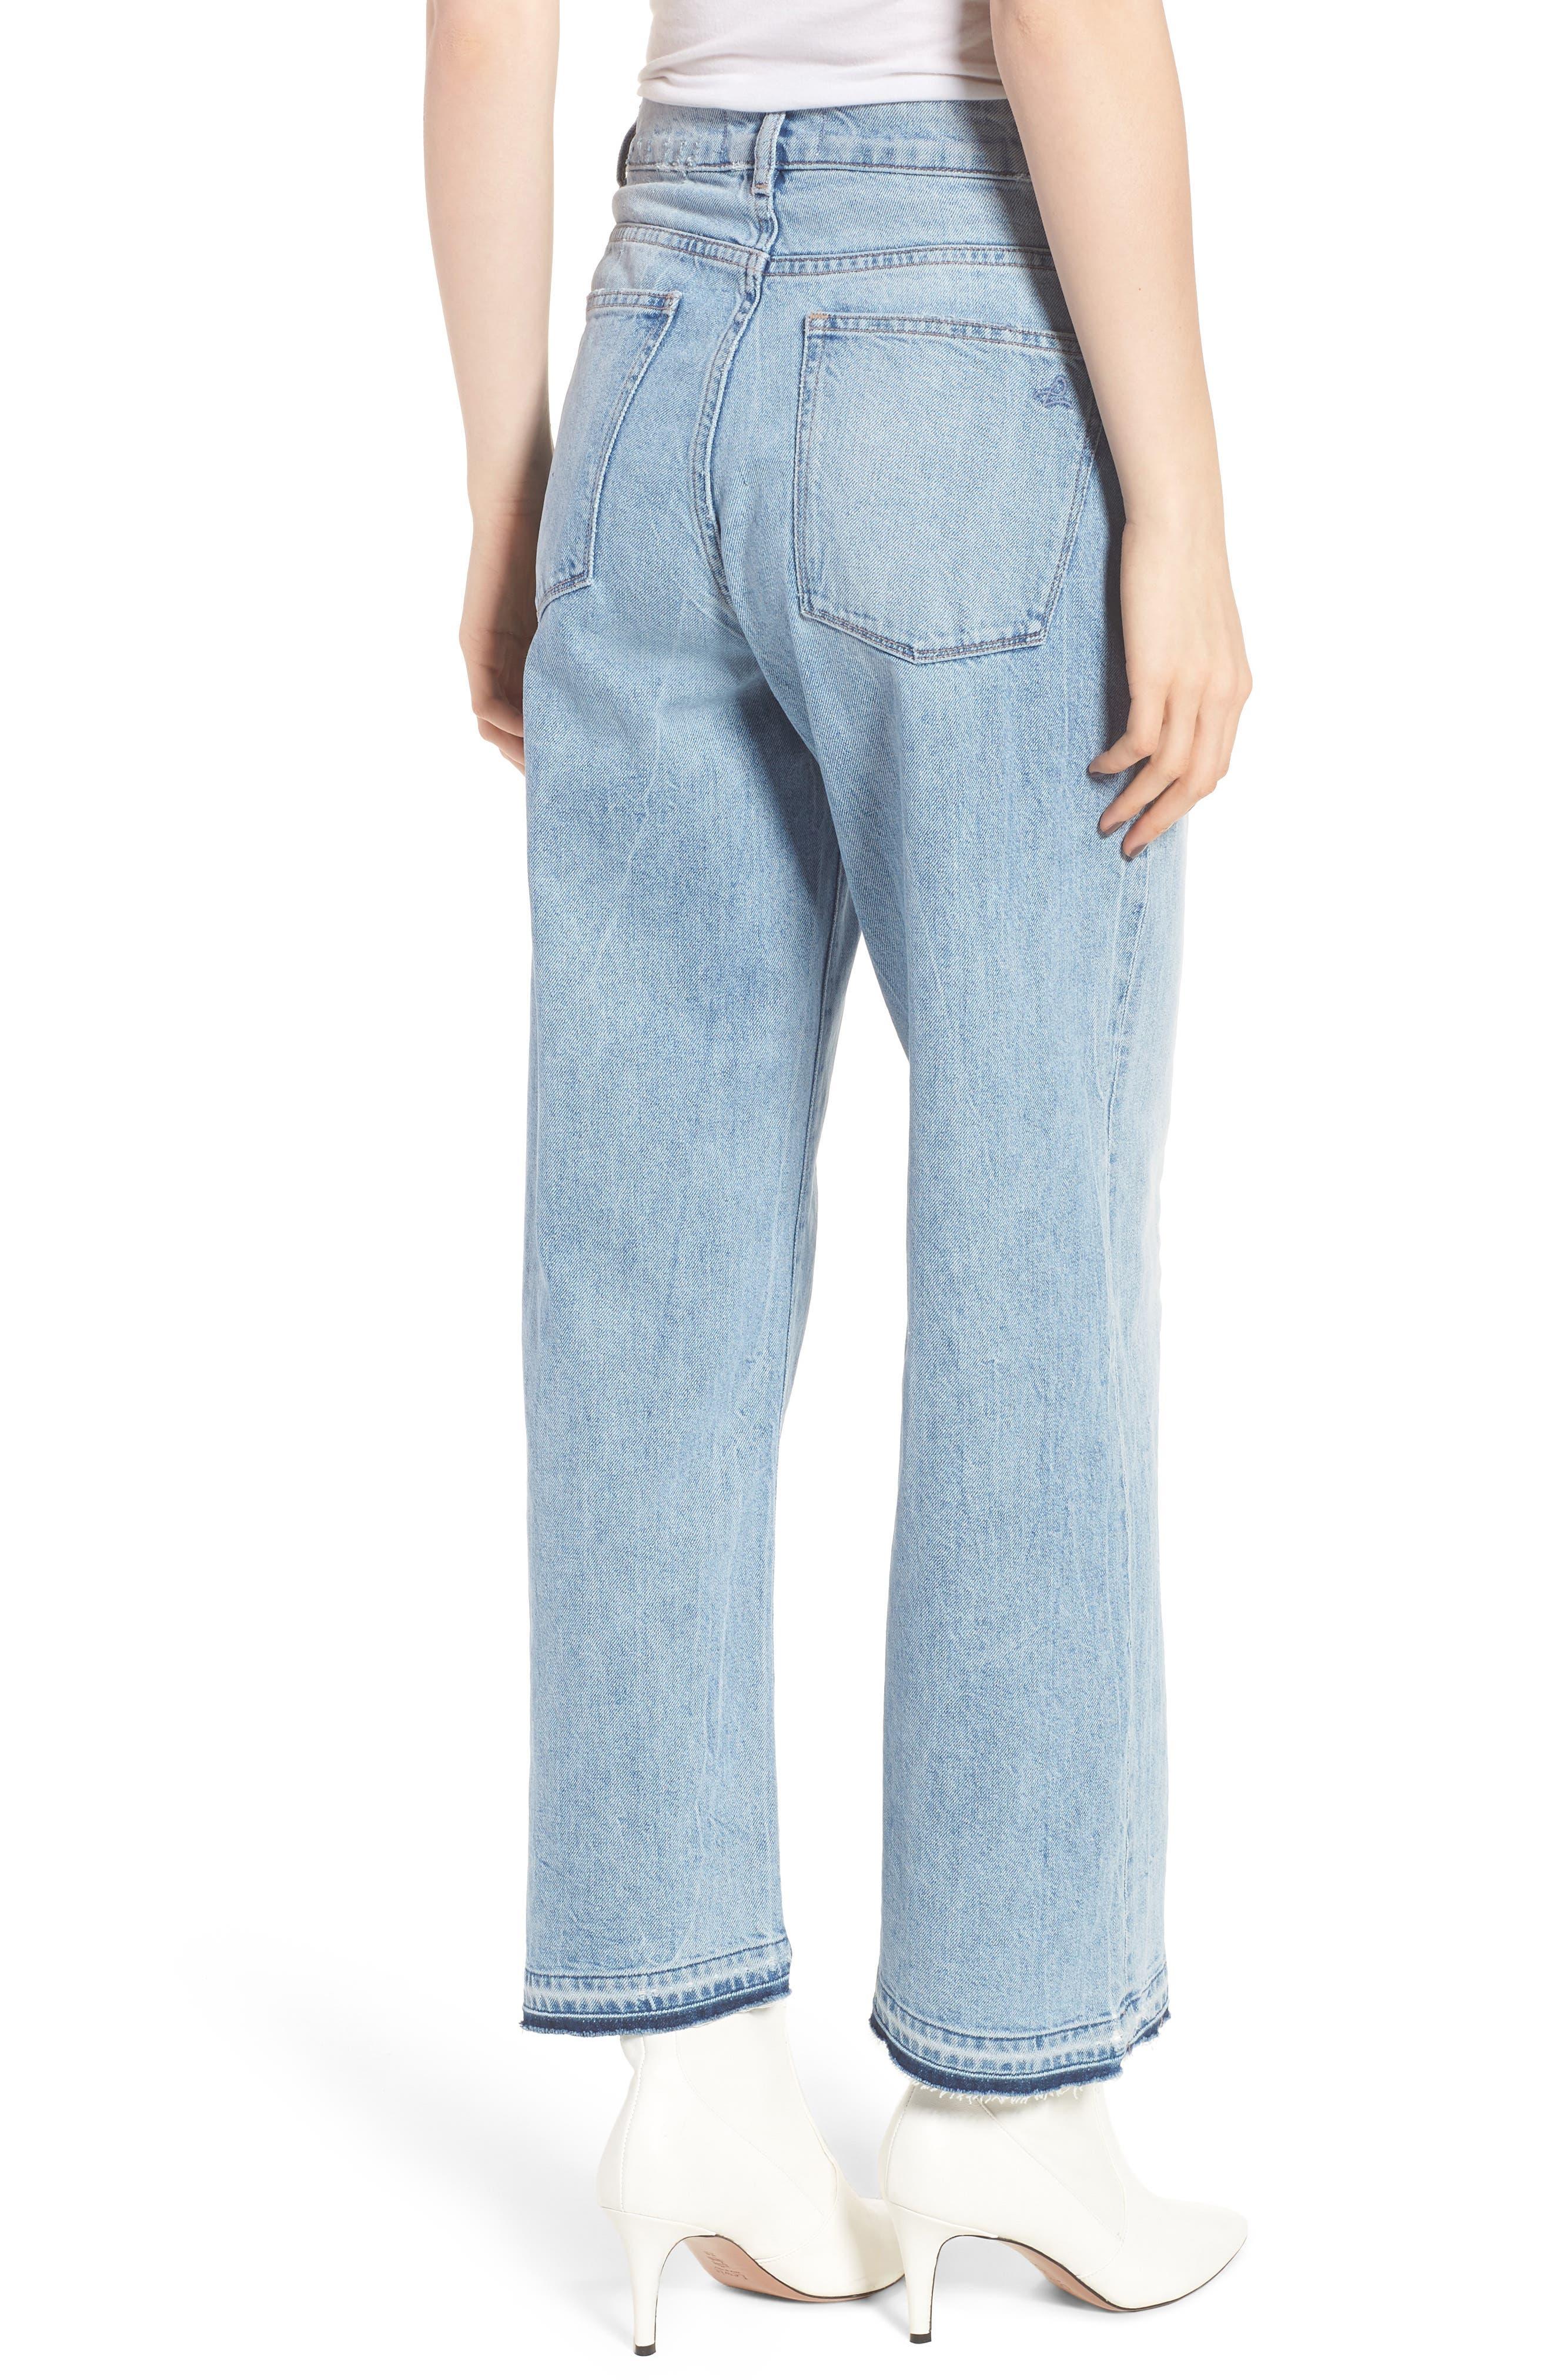 Hepburn High Waist Wide Leg Jeans,                             Alternate thumbnail 3, color,                             Oldtown